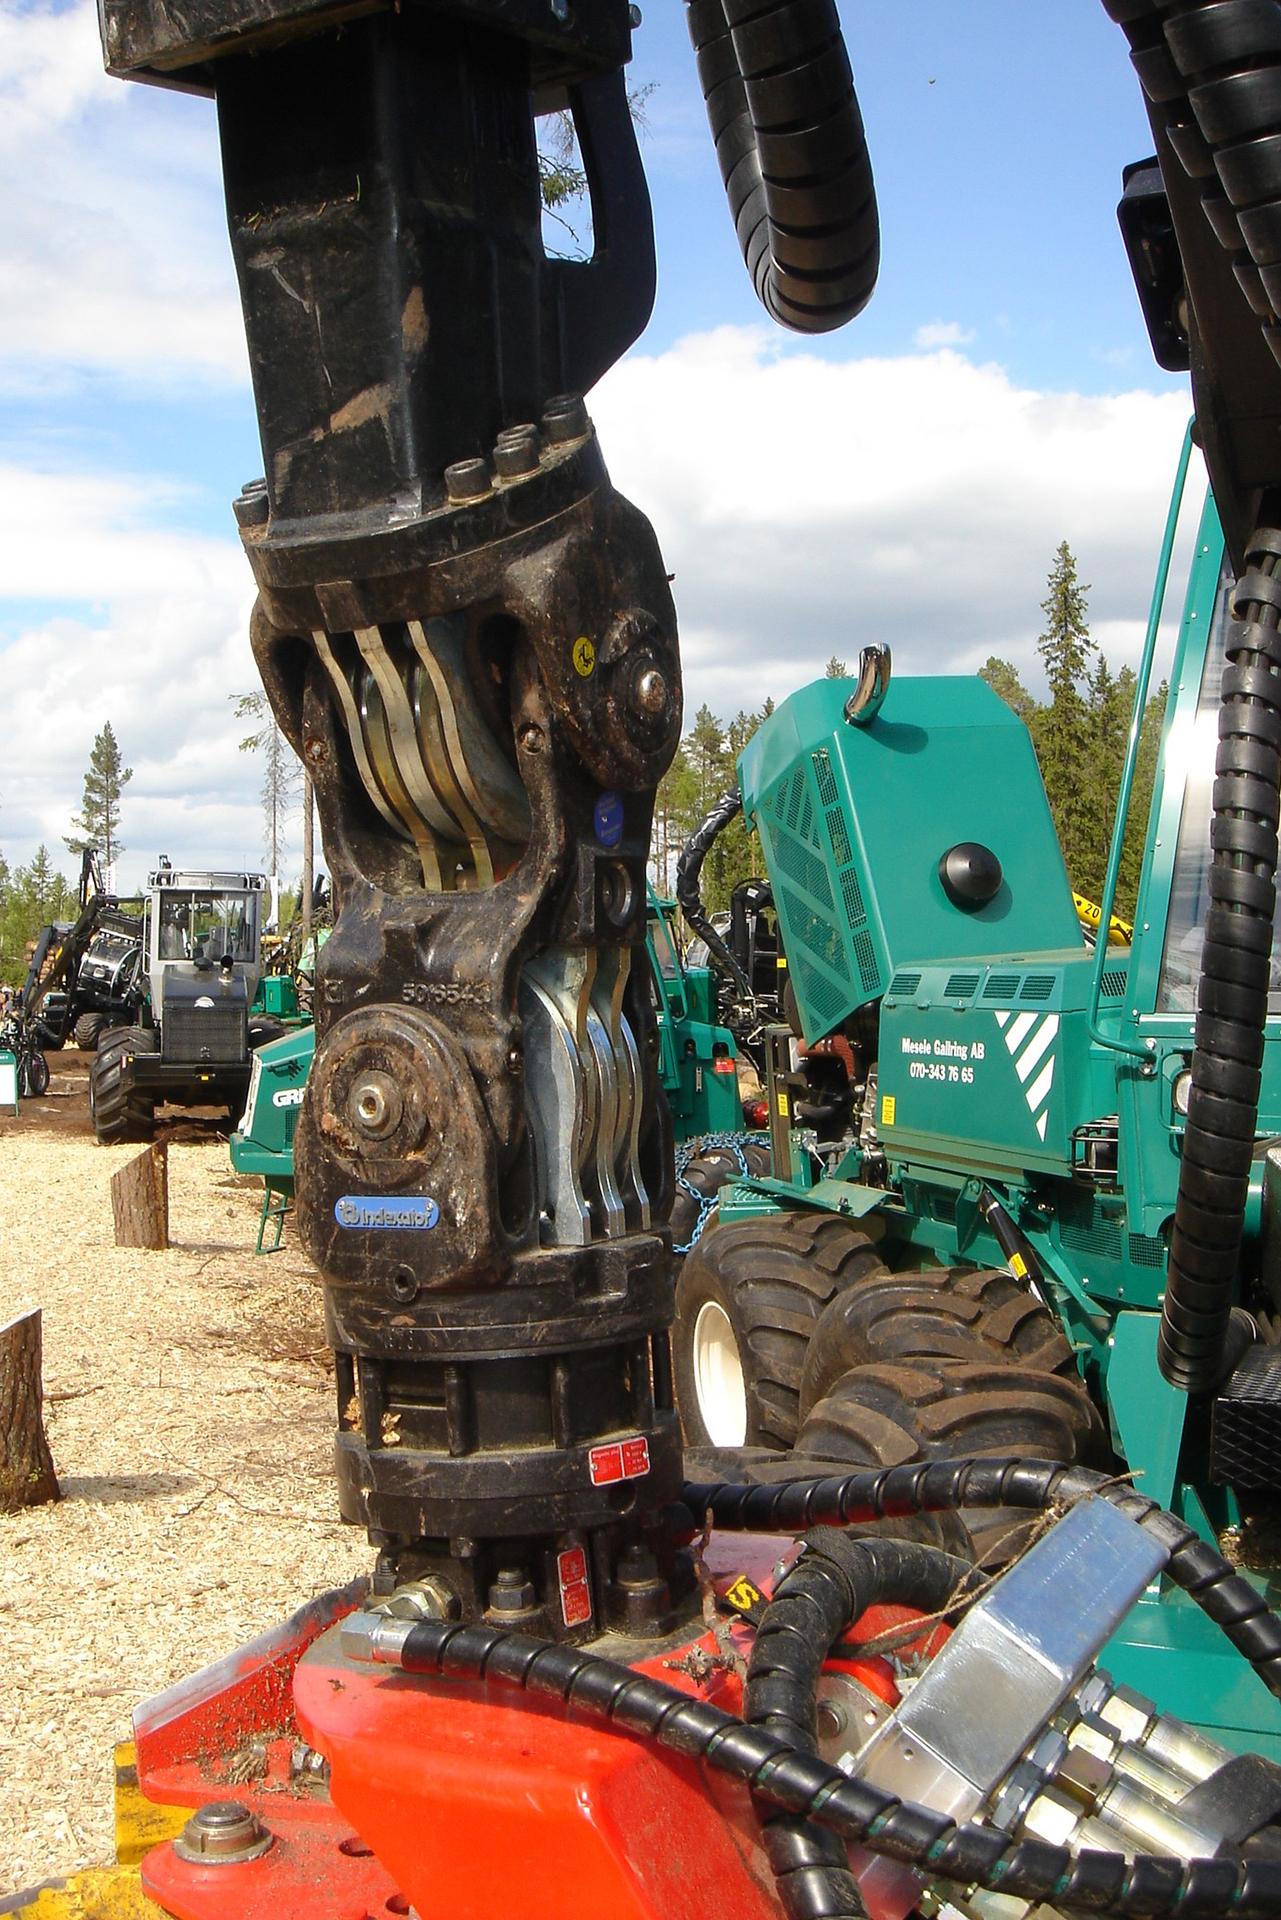 PHILIPP ForstWerkzeuge INDEXATOR Rotator H 132, 10000 Kg statische Last, hydraulischer Rotator, hydraulischer Drehservo, hydraulischer Drehmotor